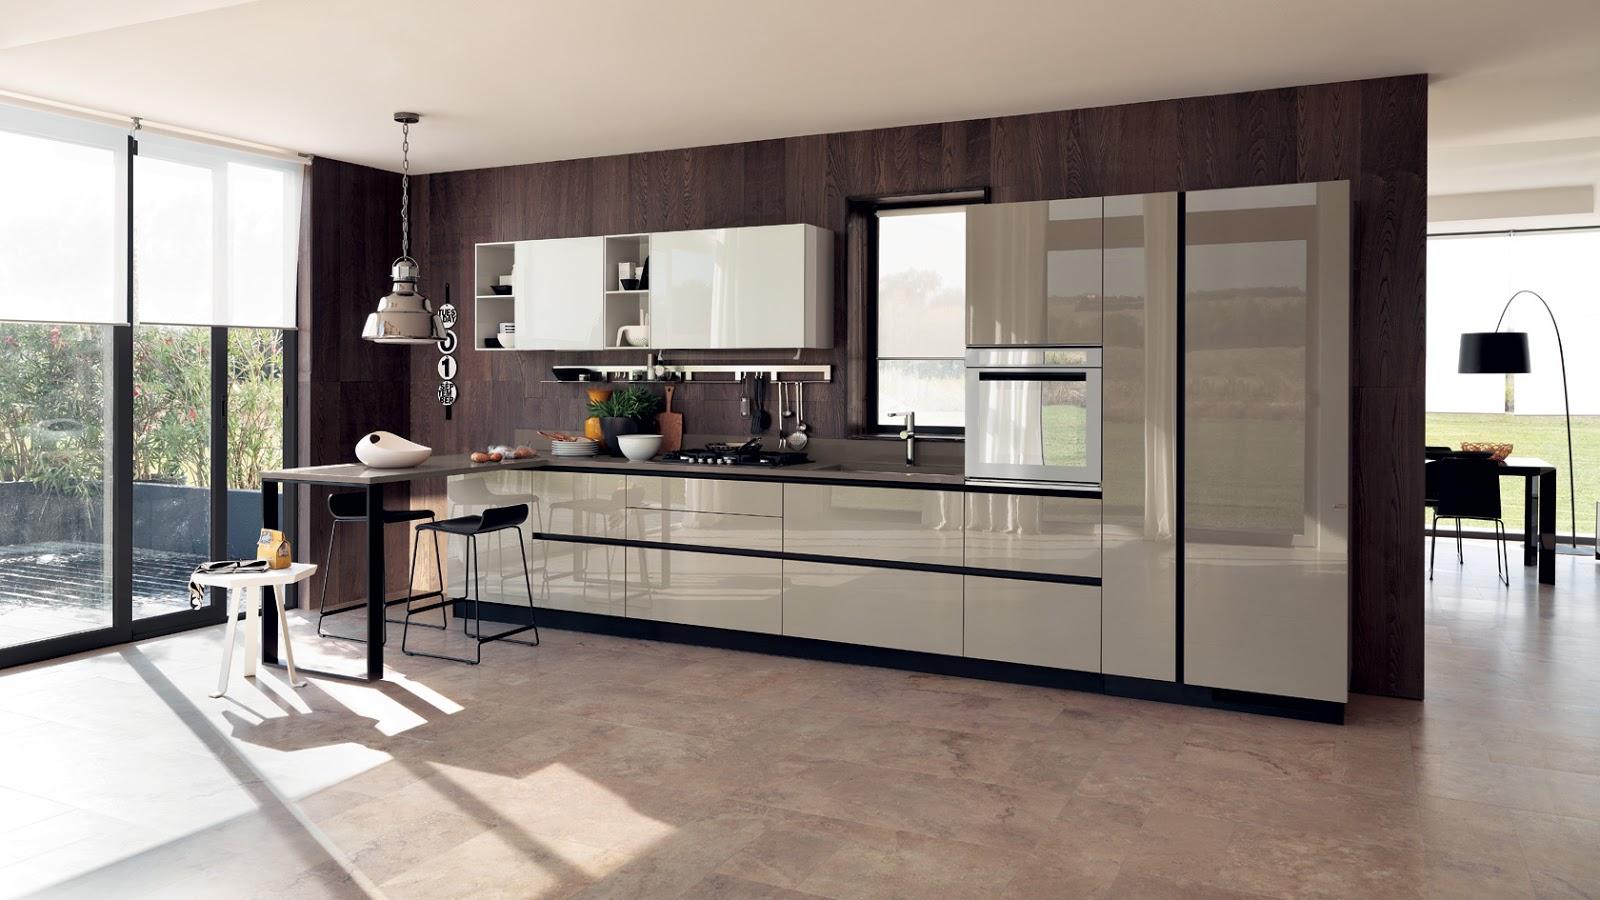 Hermosos dise os de cocinas modernas colores en casa for Diseno y decoracion de cocinas